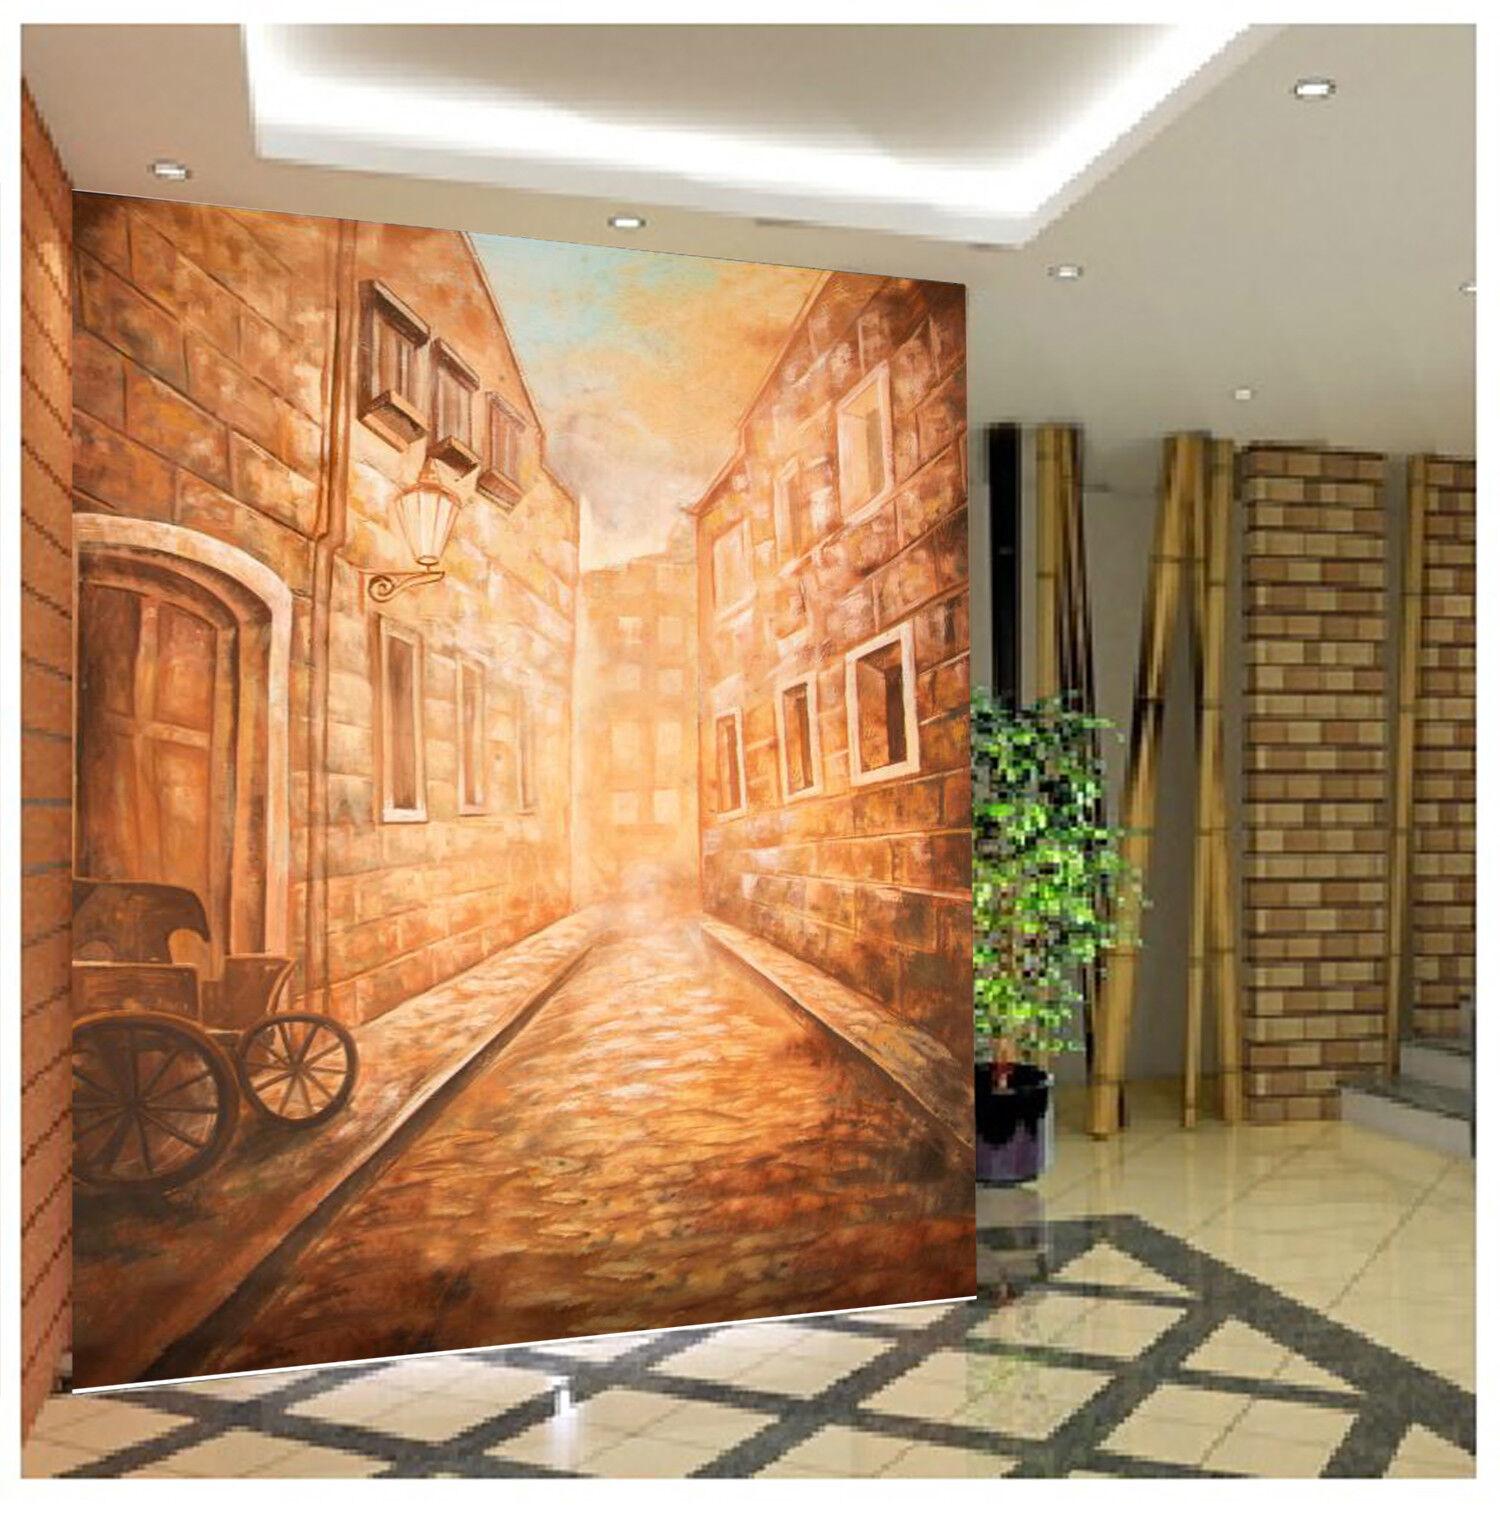 3D Street Pattern 4 Wallpaper Murals Wall Print Wallpaper Mural AJ WALL AU Lemon